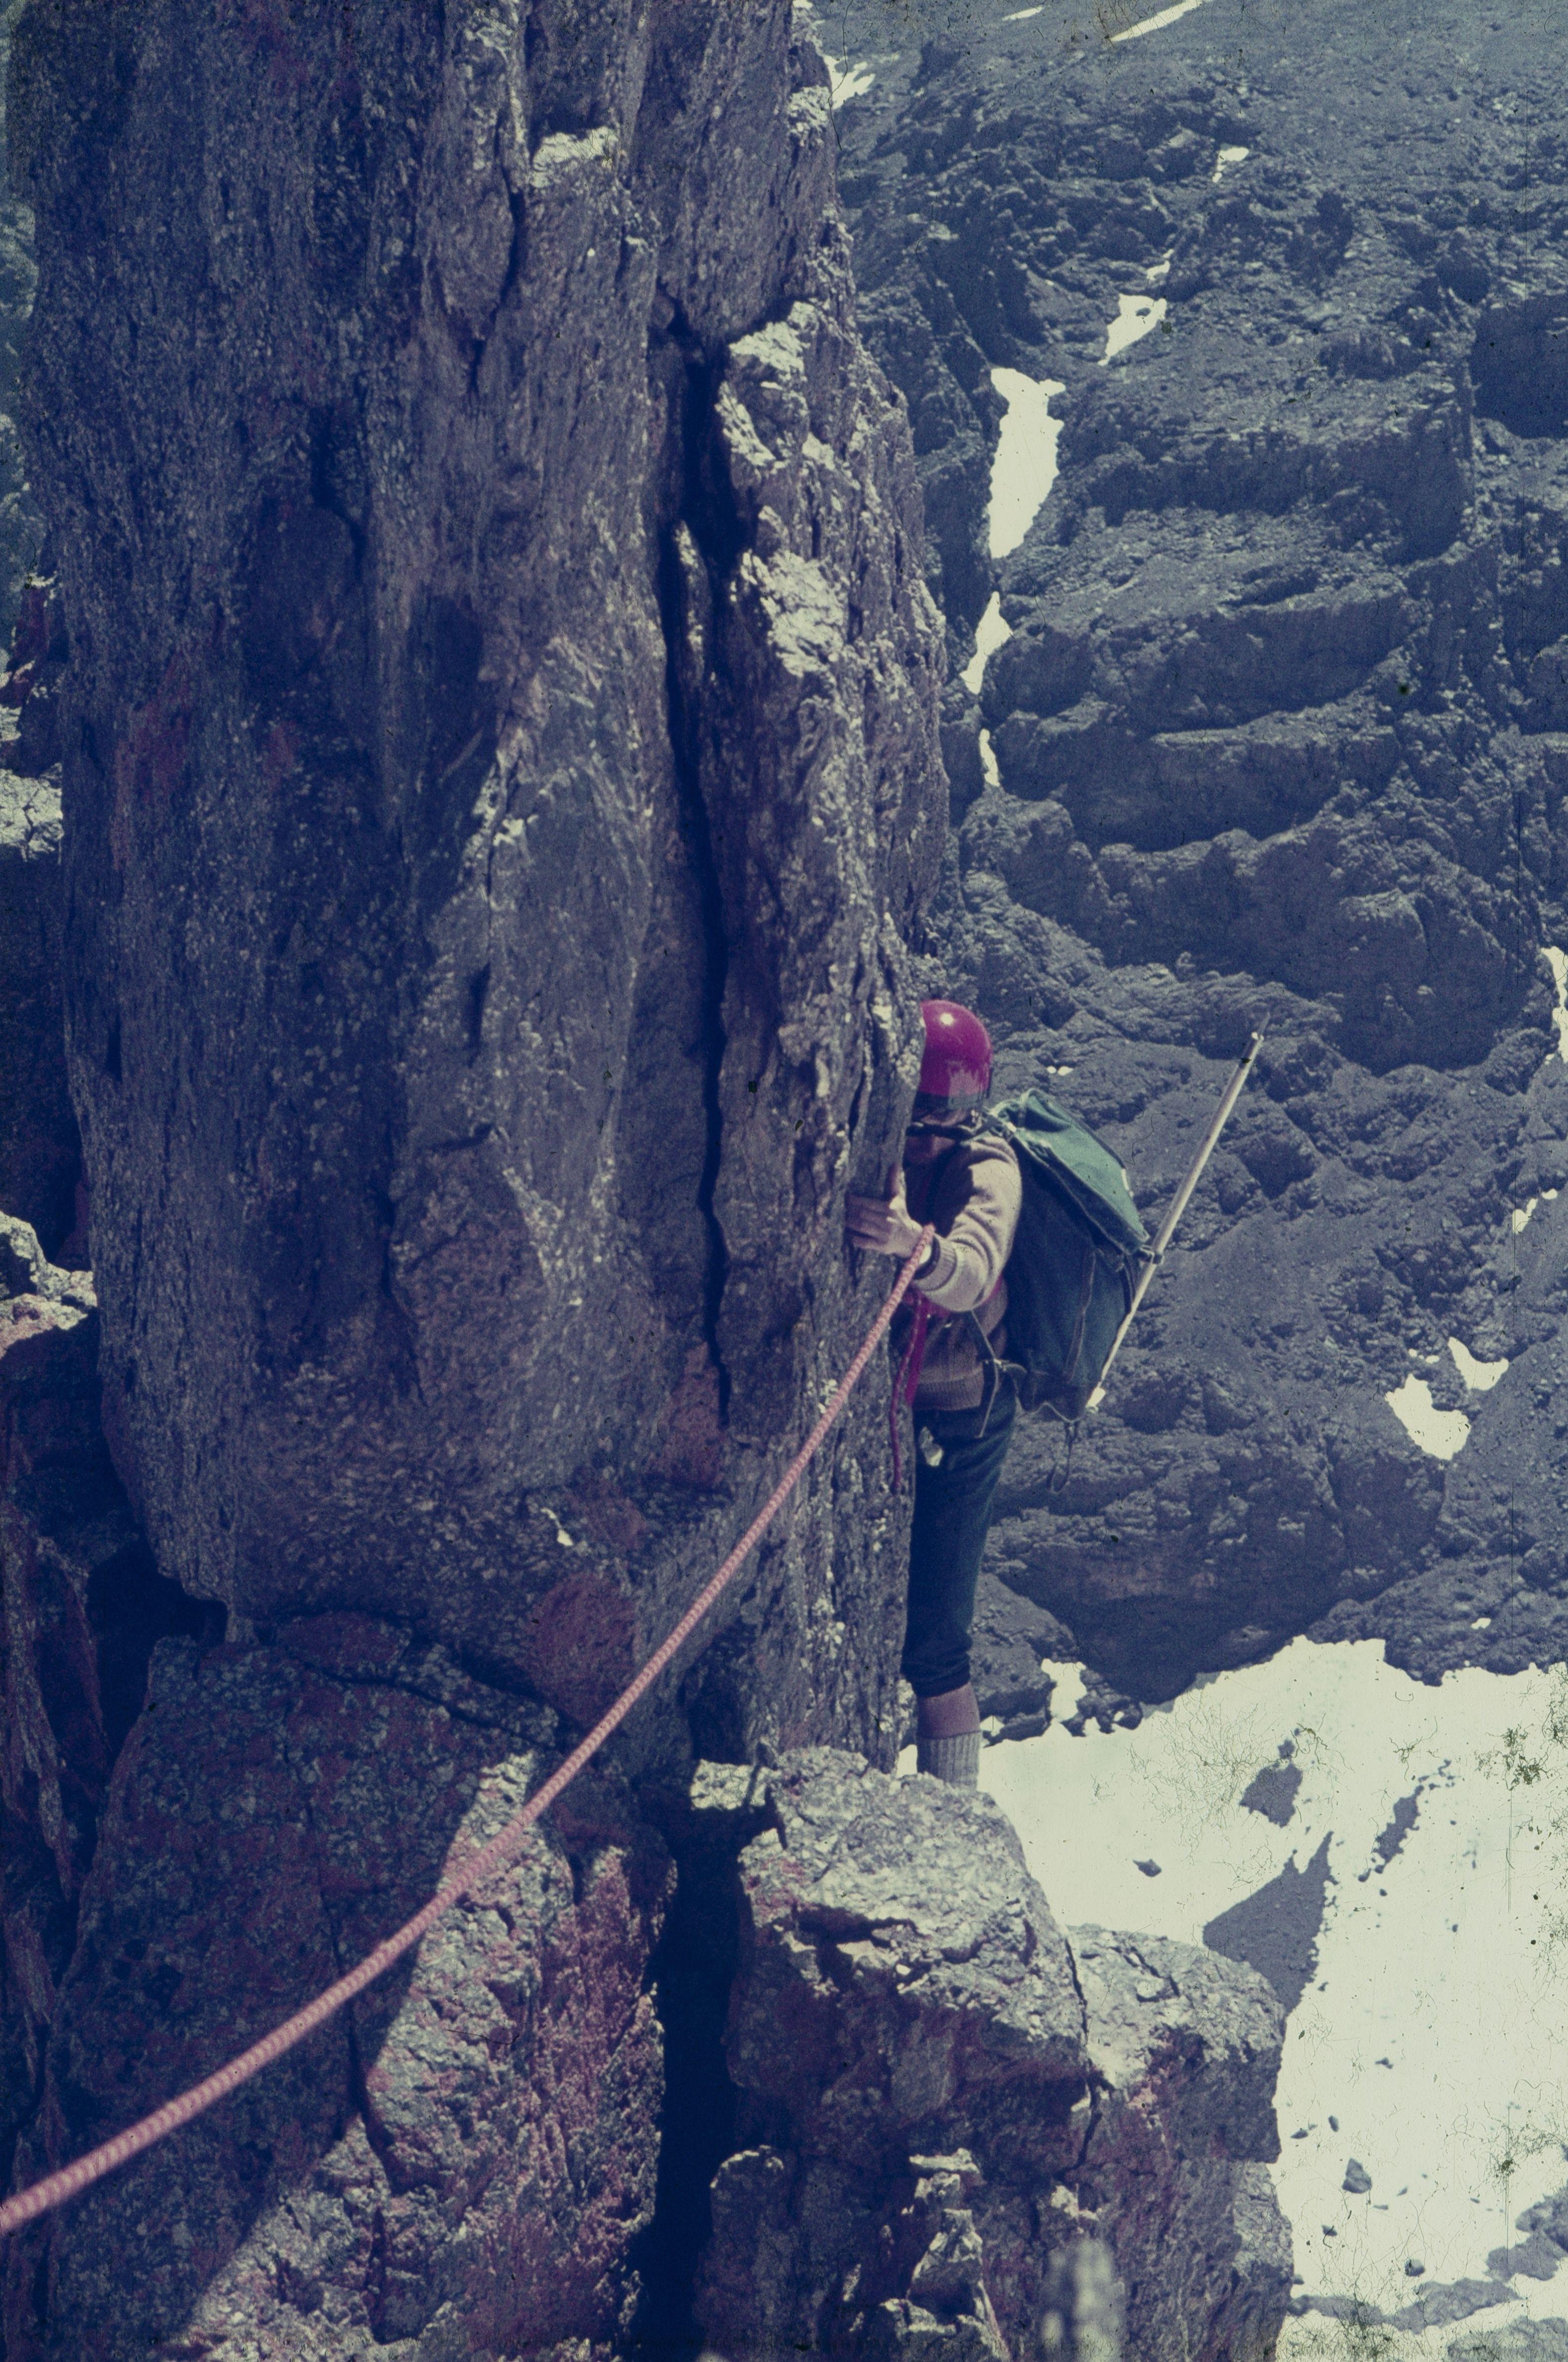 aresta est del pic tadat de 3,980 m